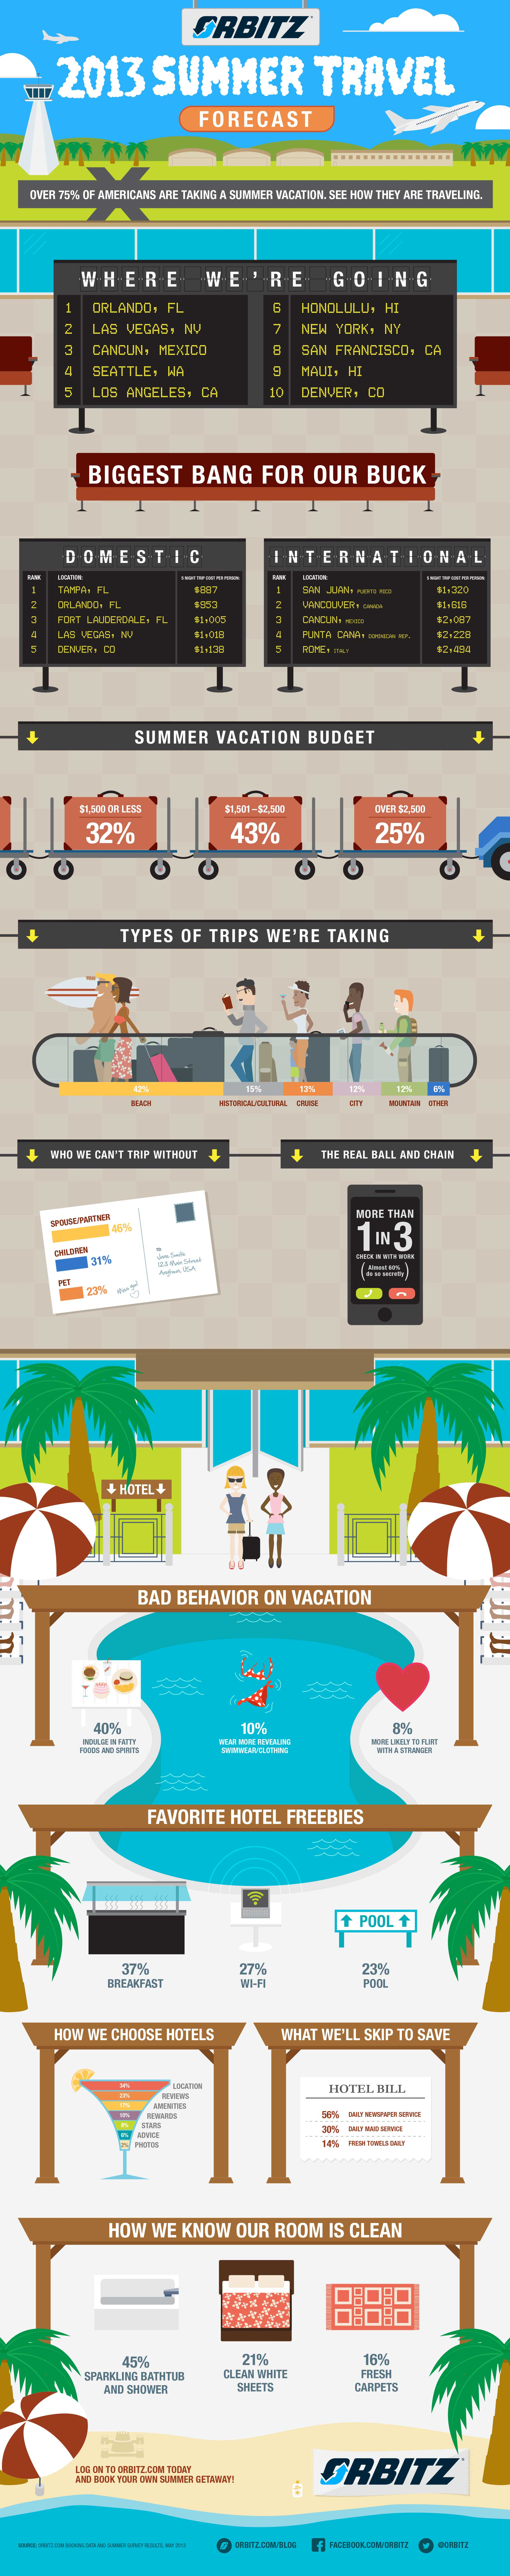 Orbitz_SummerSurvey_Infographic